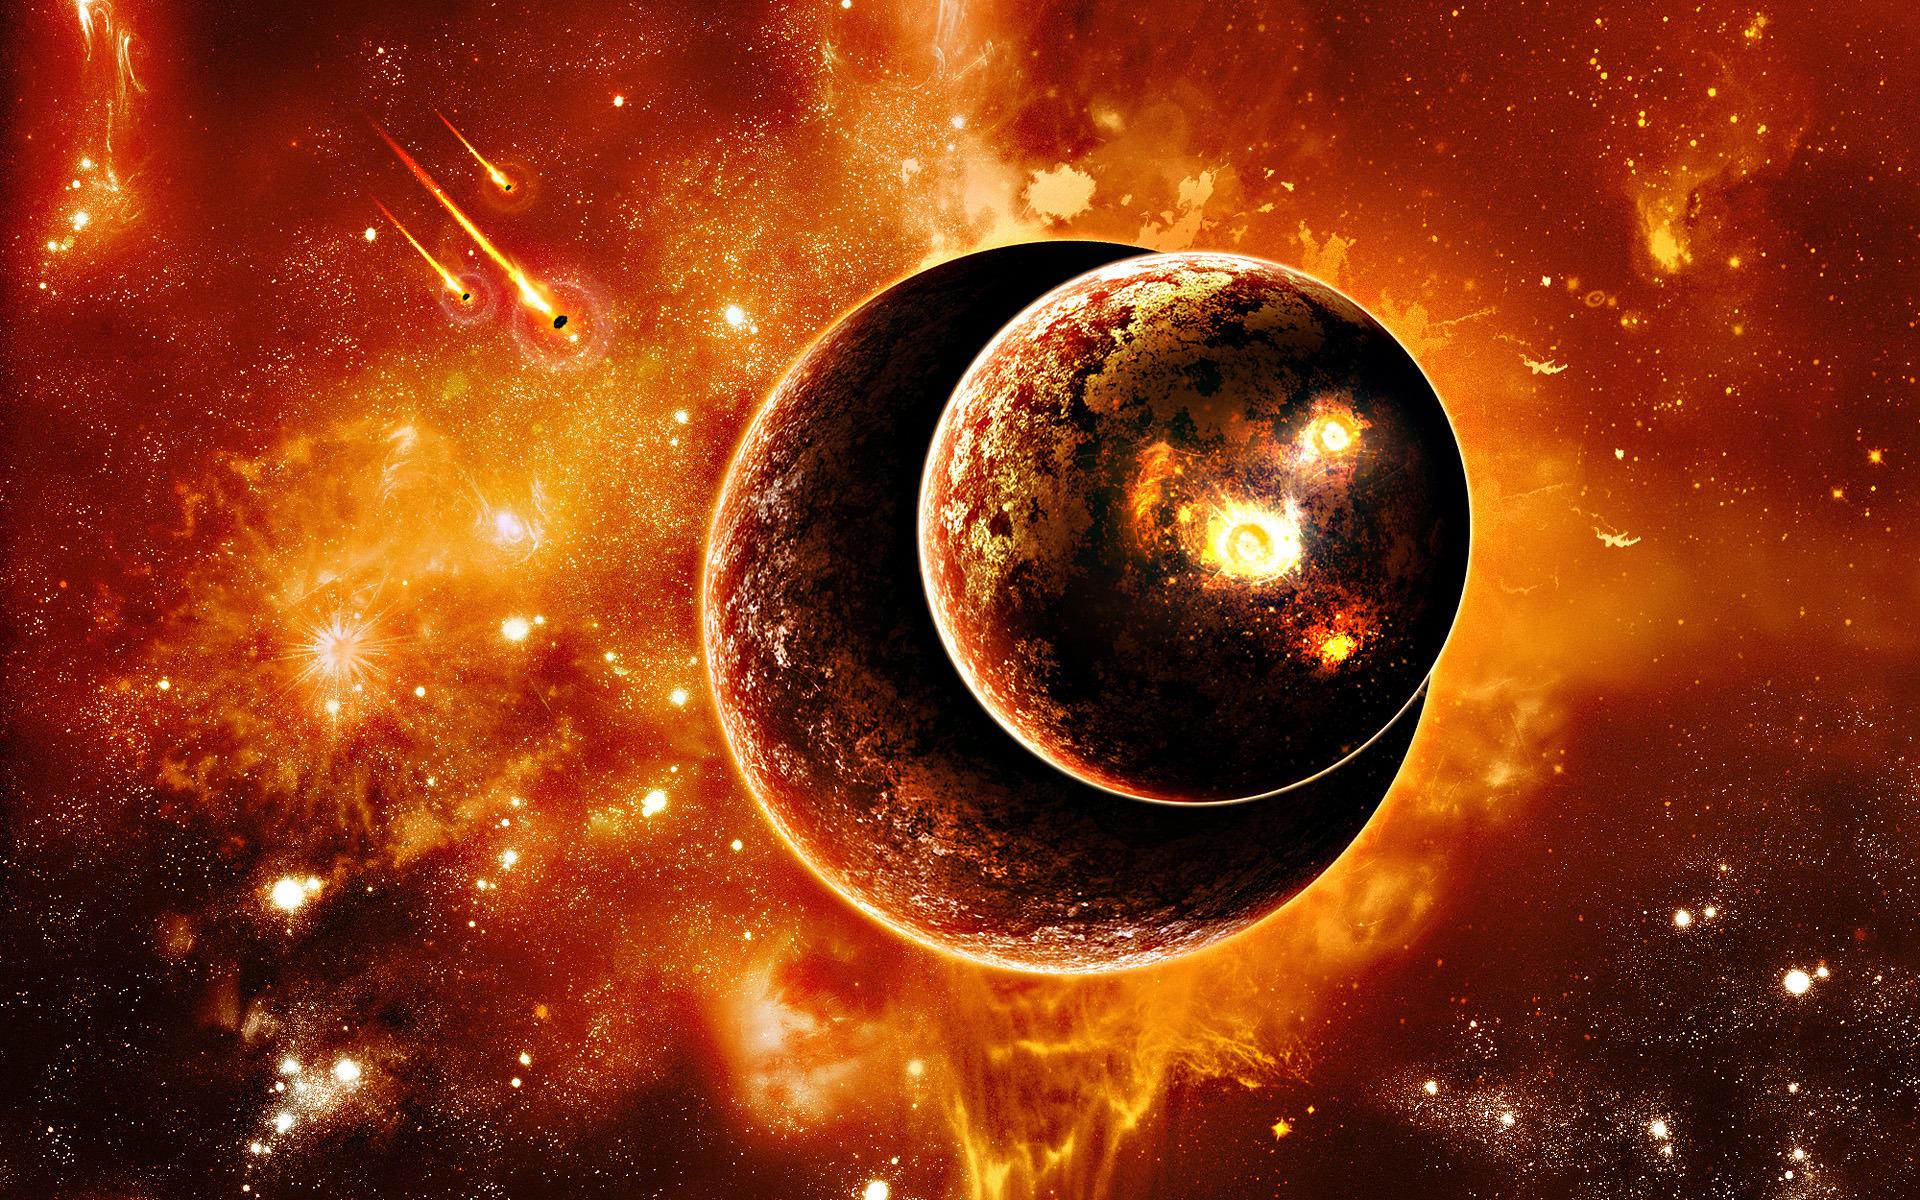 Bakgrundsbilder ID704847 Ladda Ner Next Wallpaper Foregaende Bakgrundsbild Space Apocalypse